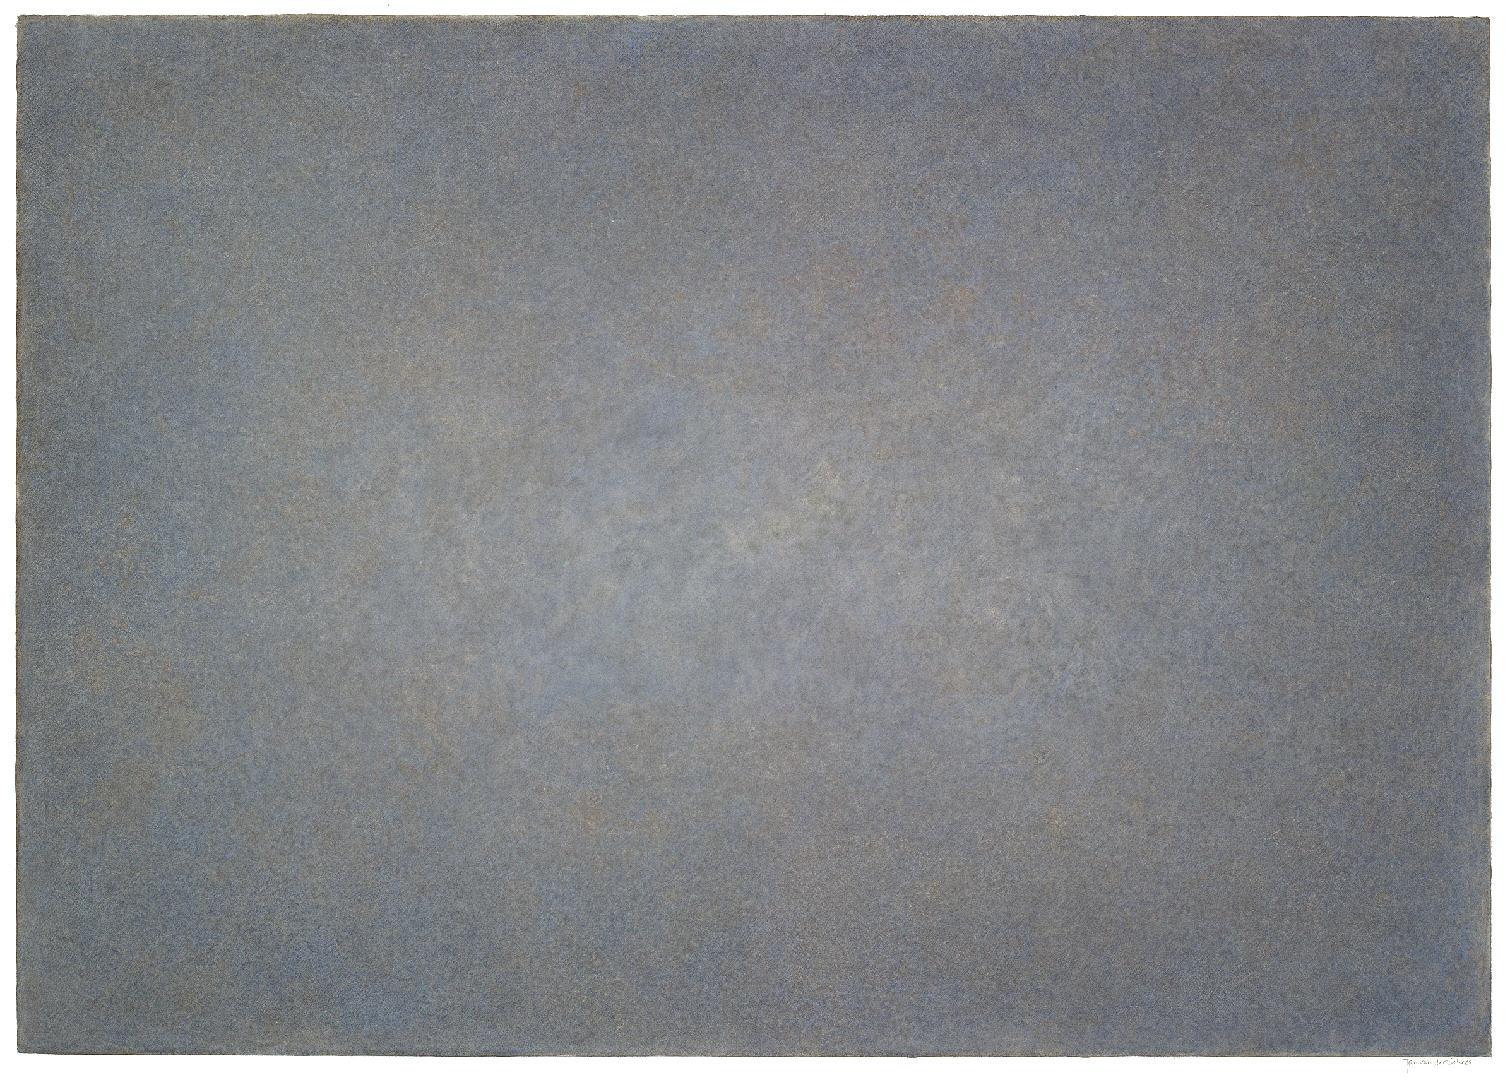 2013 Oneindig (70 X 100 cm) 17050w